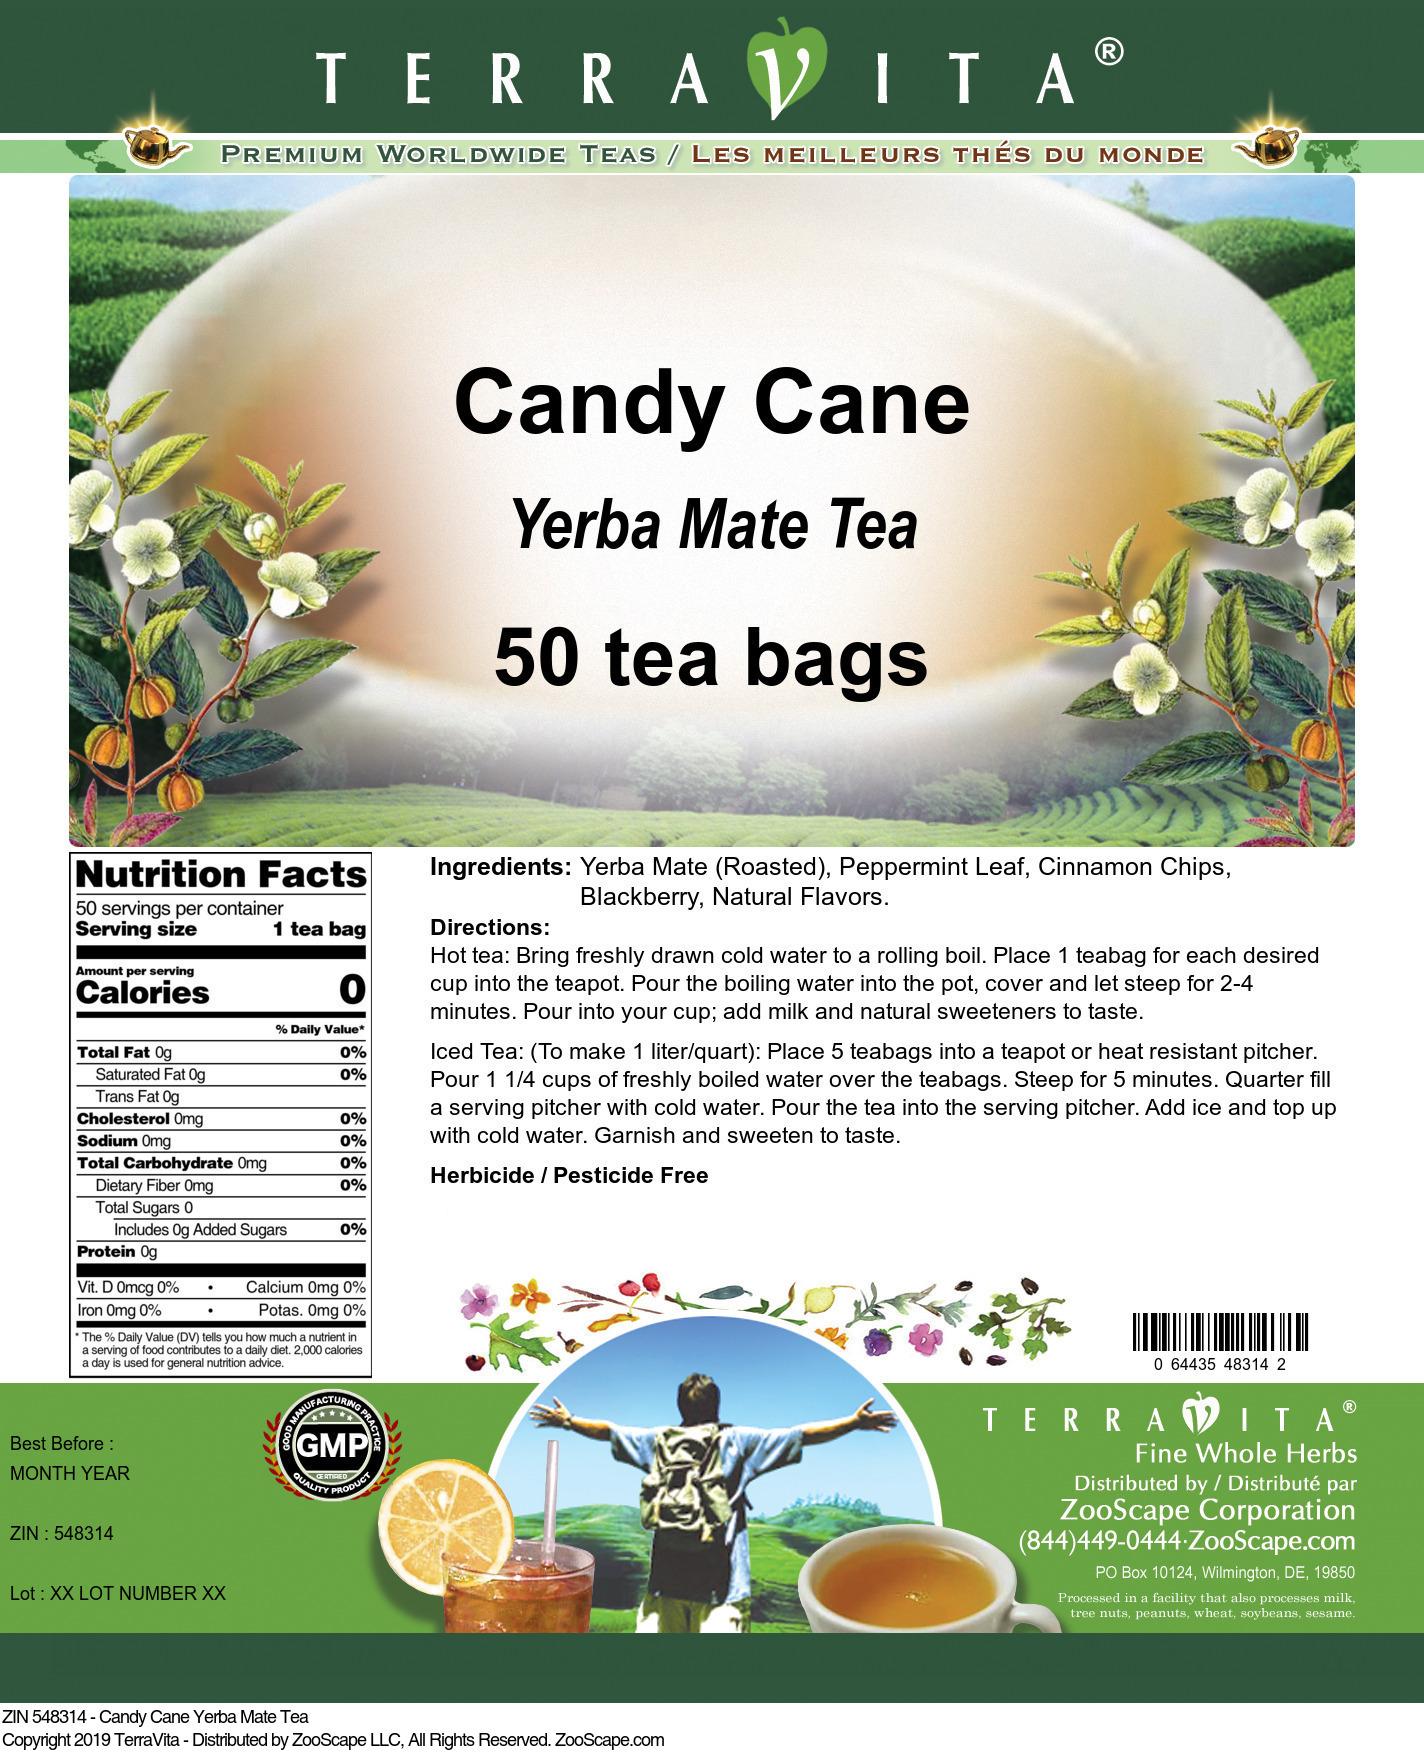 Candy Cane Yerba Mate